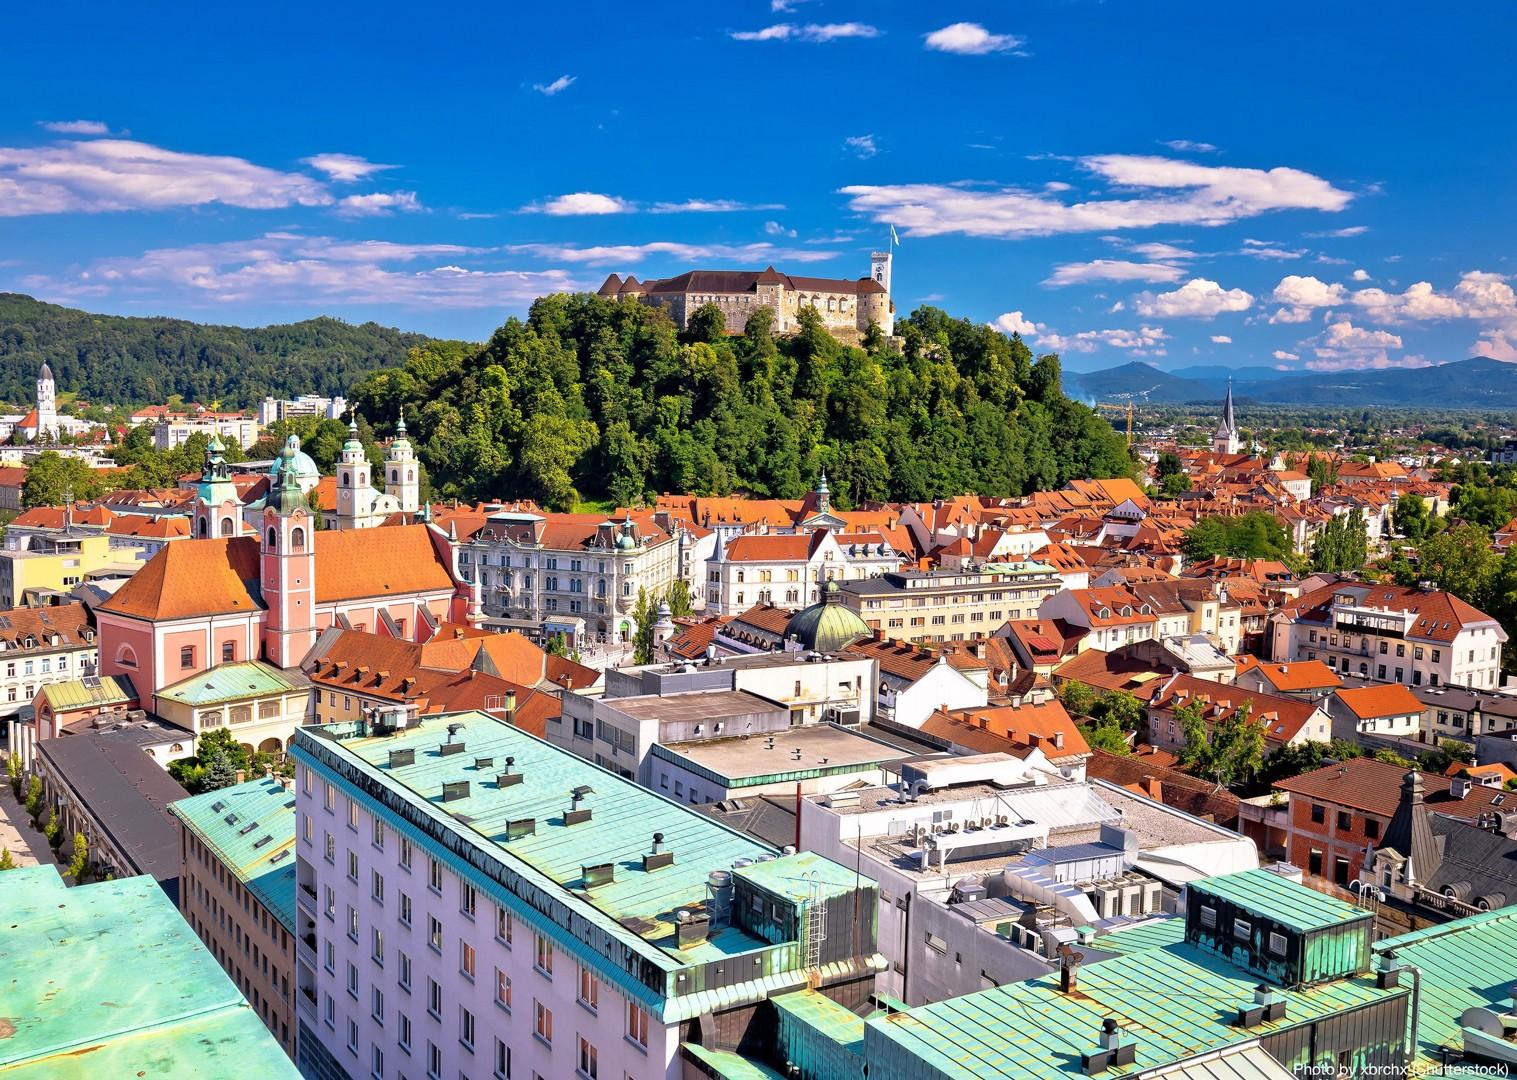 ljubljana-self-guided-leisure-cycling-holiday-slovenia-capital-to-coast.jpg - Slovenia - Capital to Coast - Self-Guided Leisure Cycling Holiday - Leisure Cycling